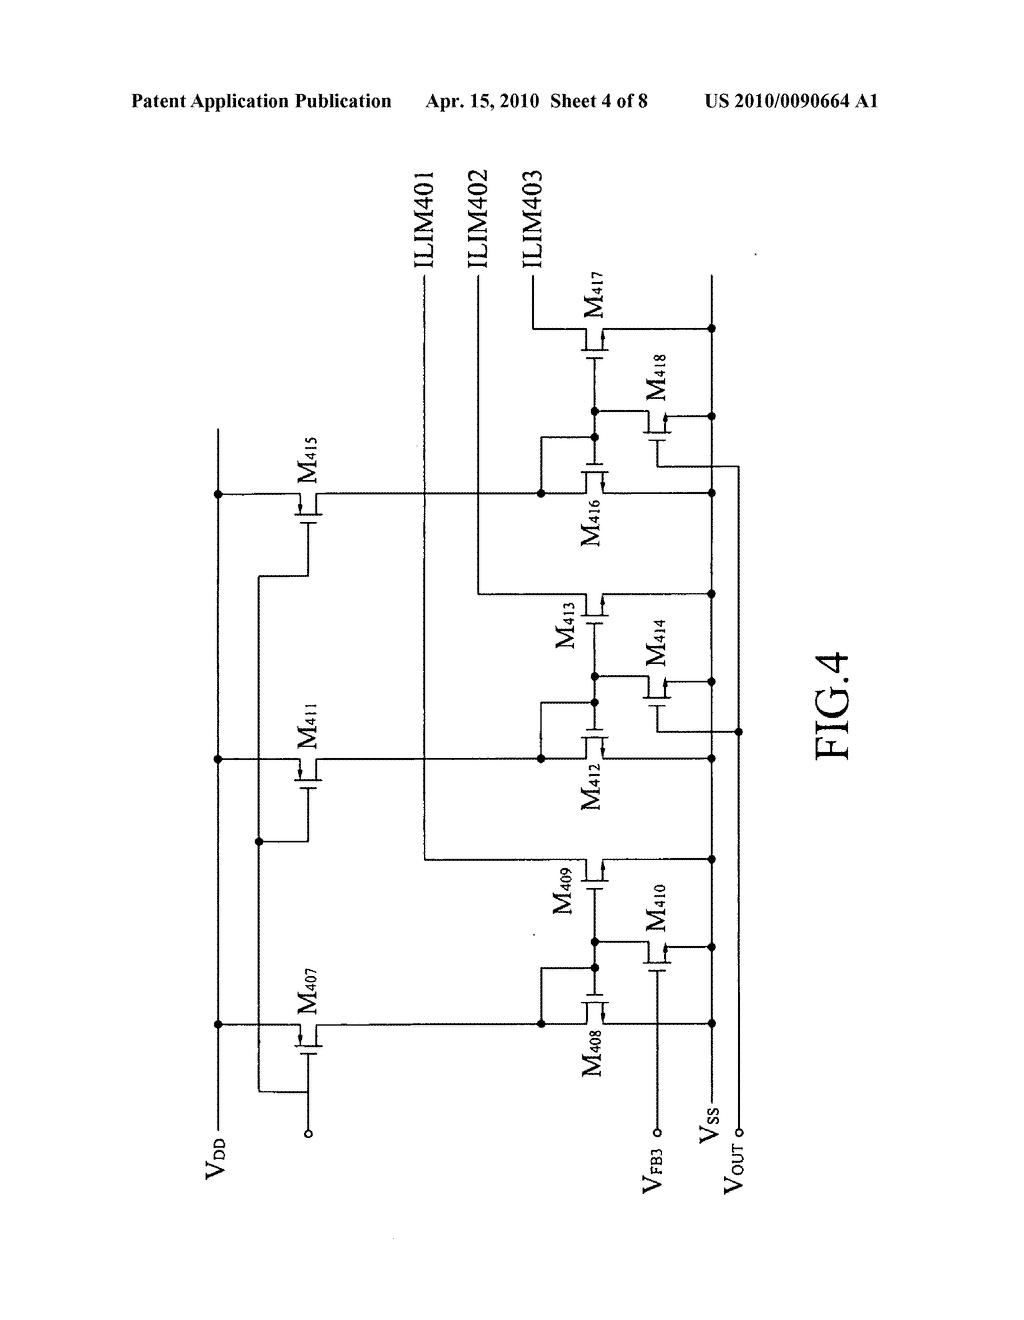 Foldback Current Limiting Circuit Diagram 41 Wiring Images Voltage Divider Tradeoficcom 20100090664 05 Regulator Having Active